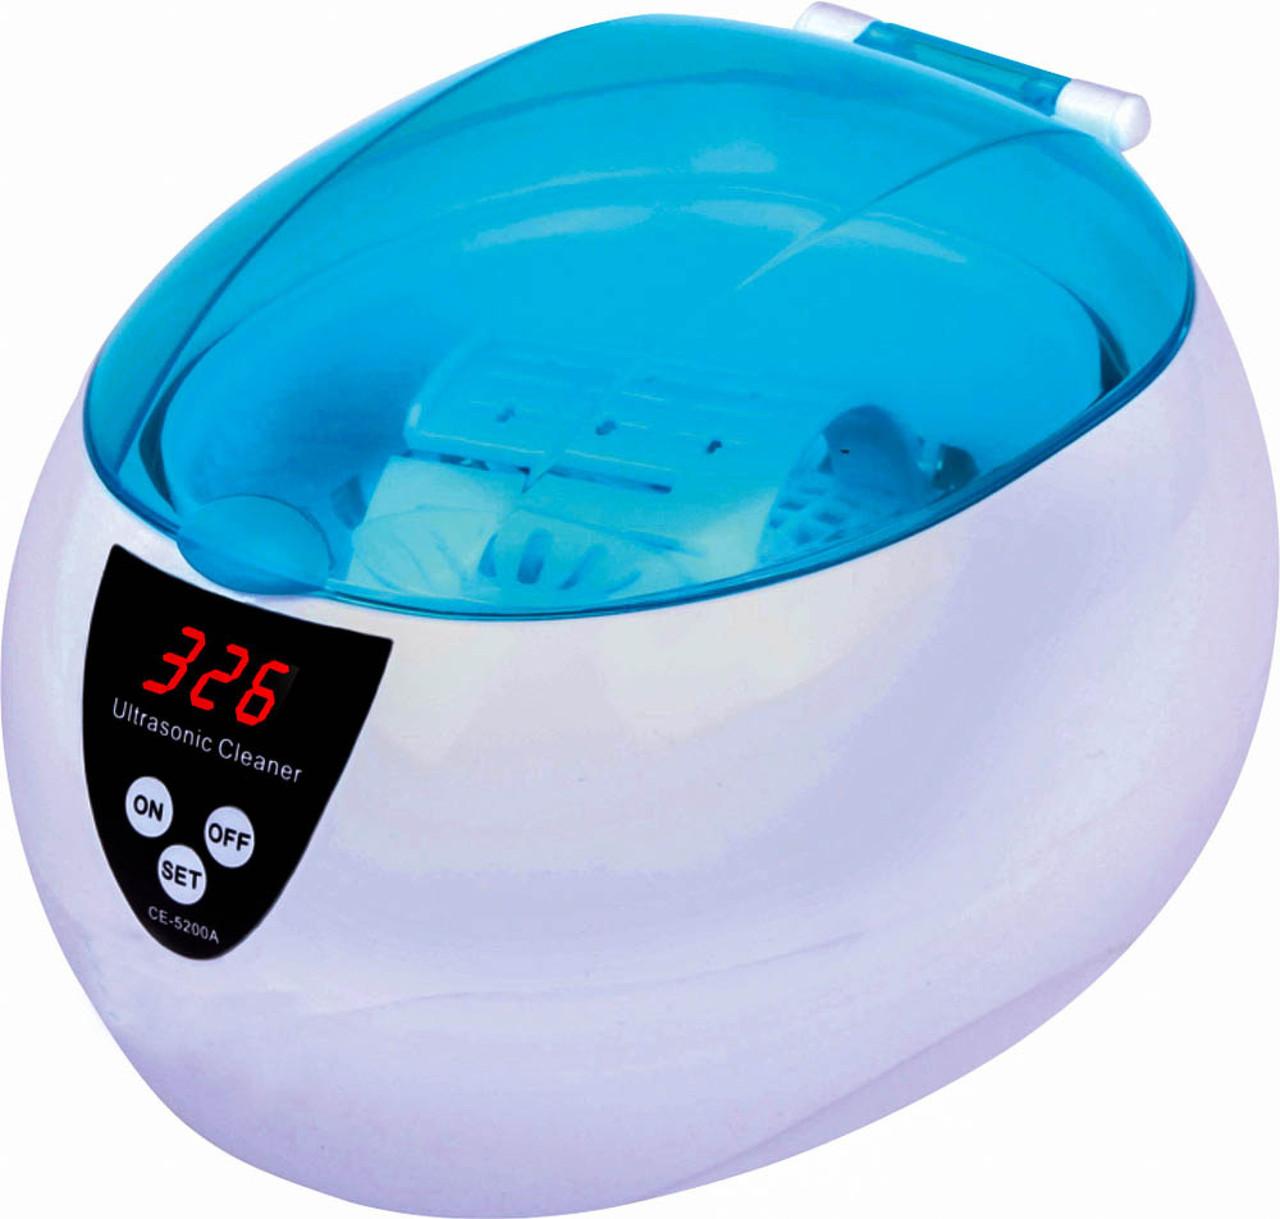 Ультразвукова ванна Jeken CE-5200A (0,75 л).